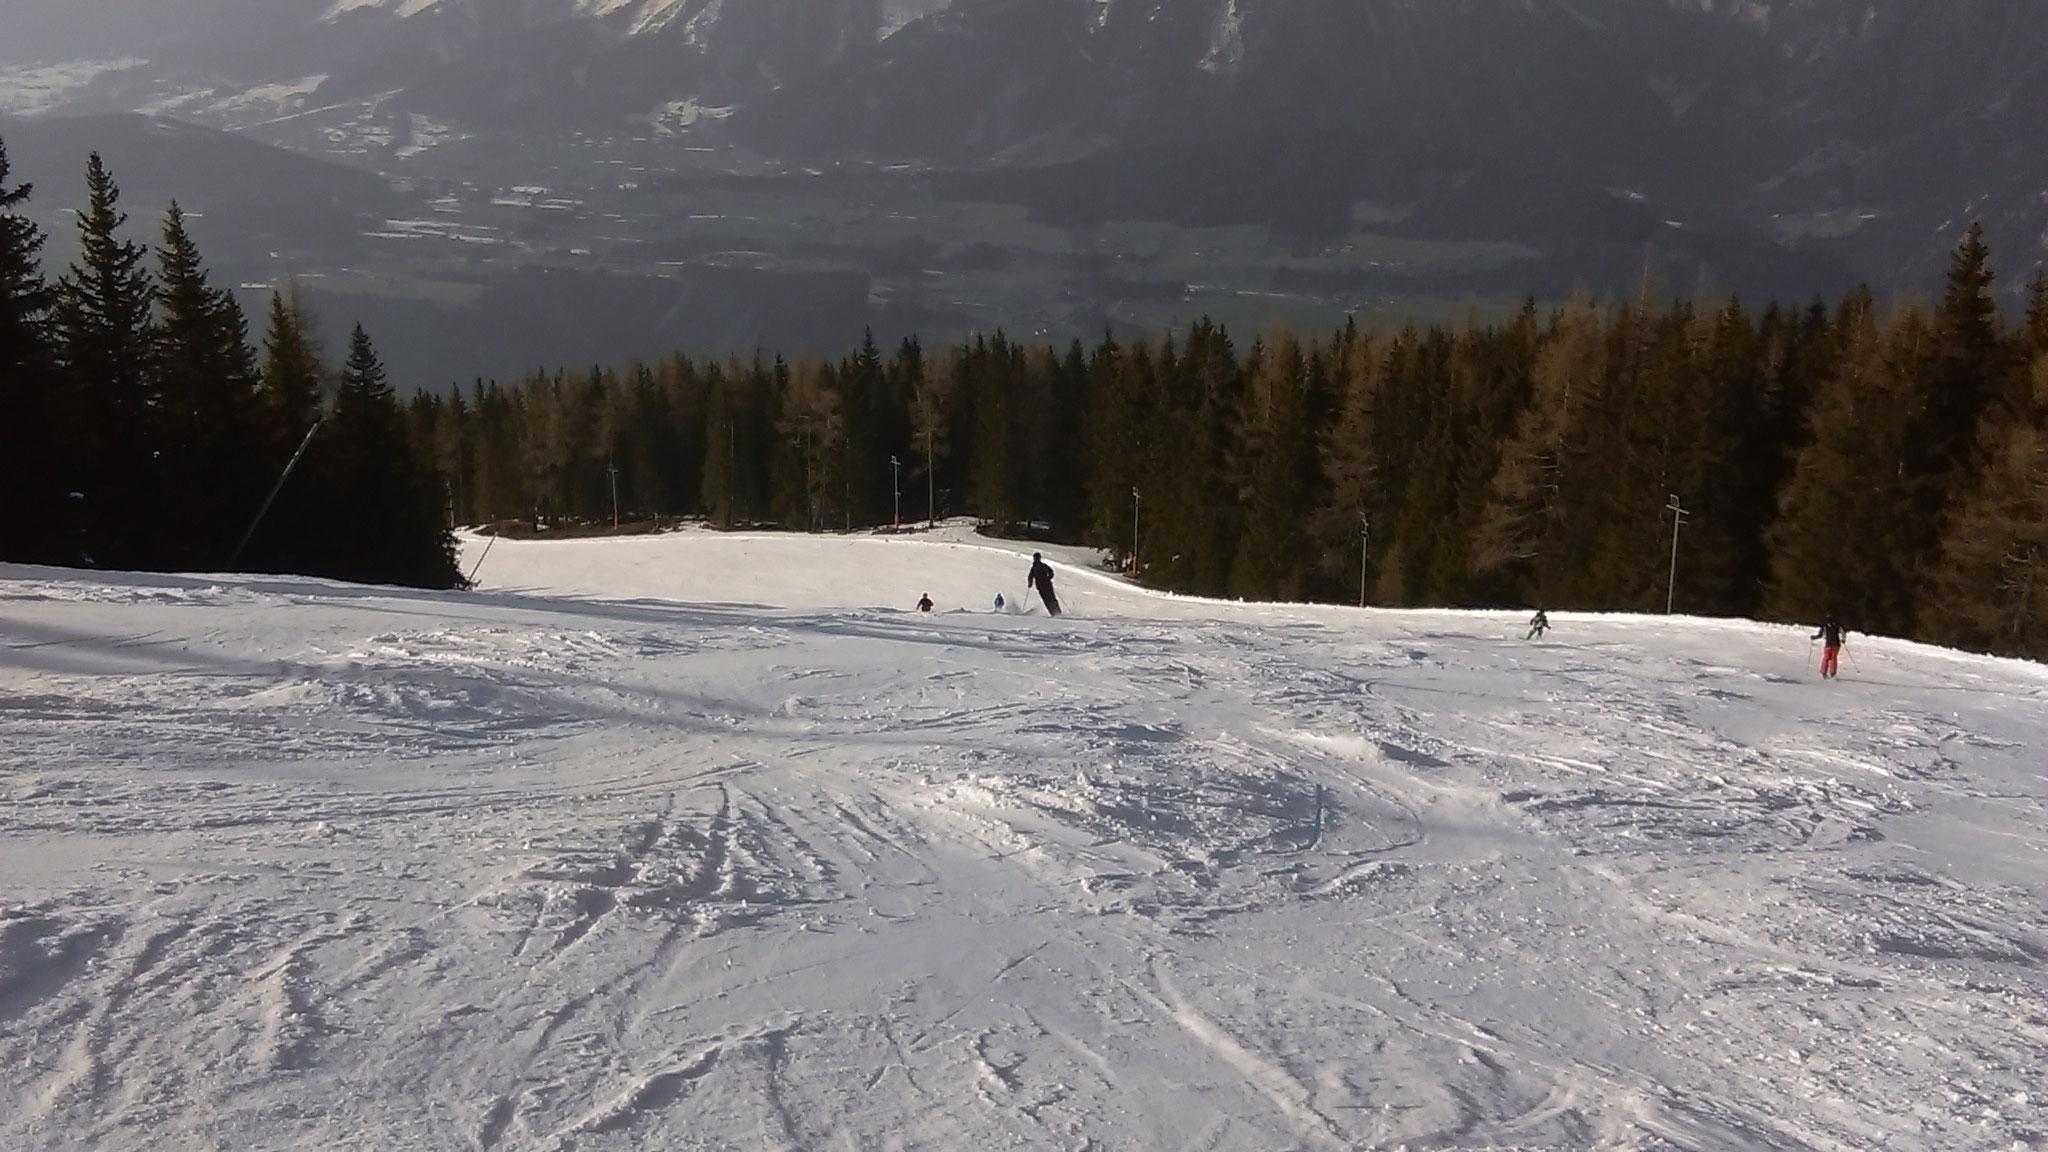 Downhill skiing on Planai